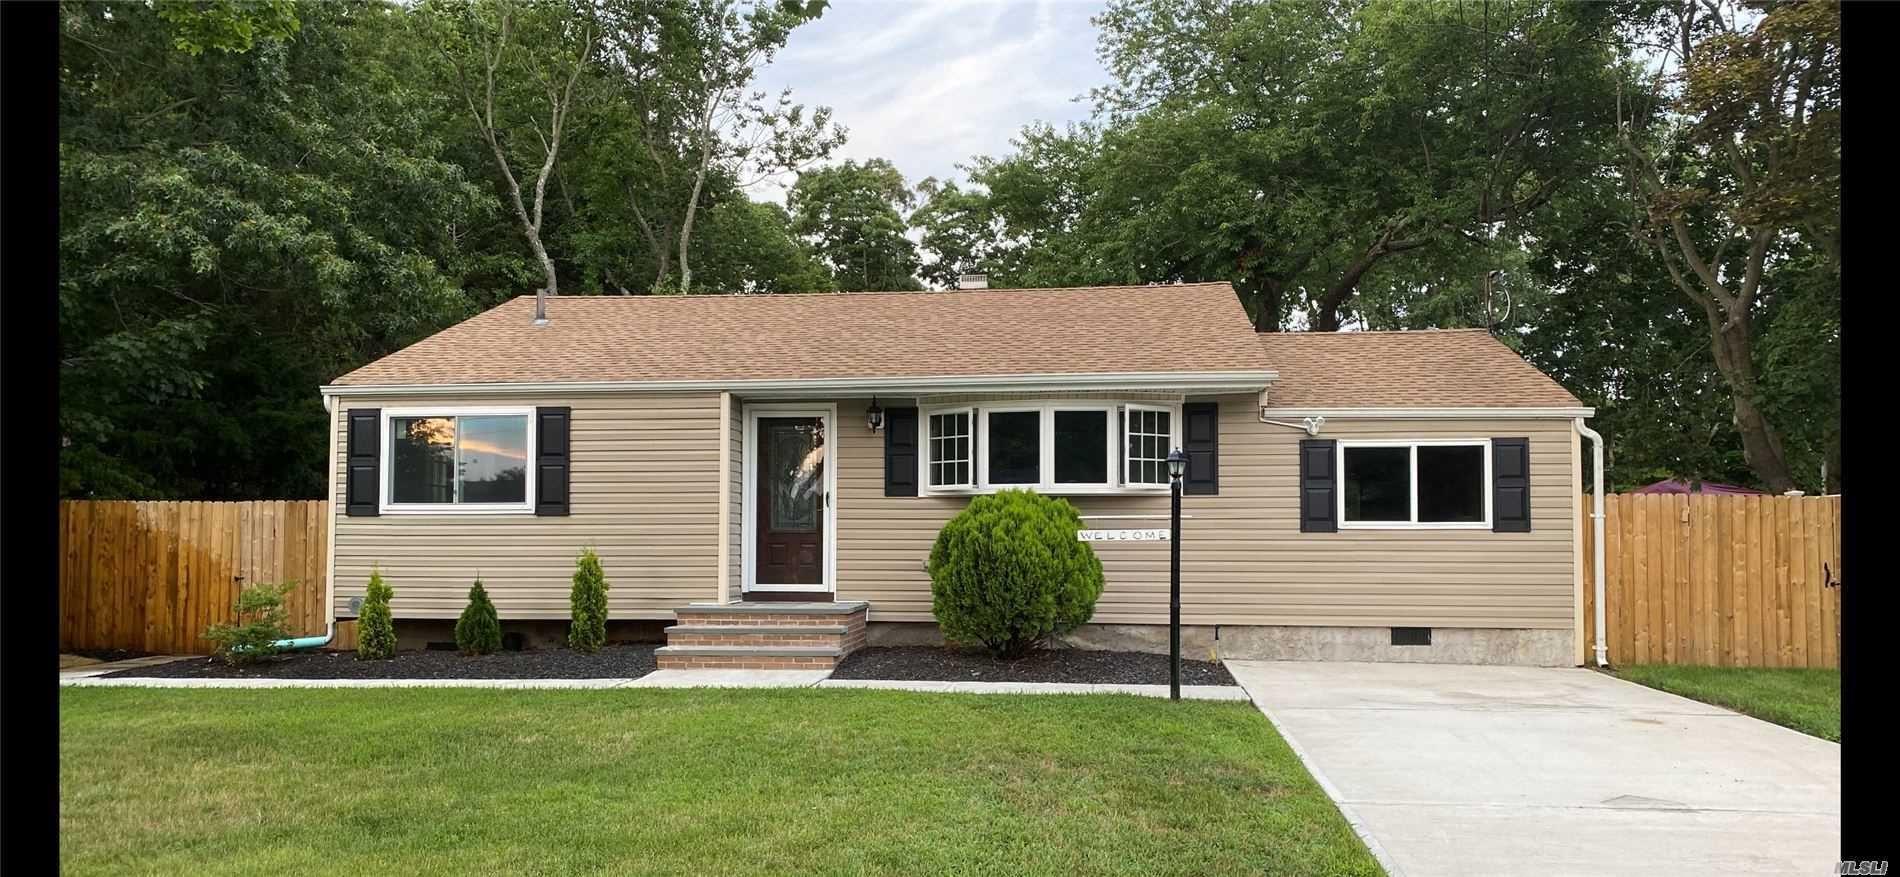 21 Sarah Drive, Lake Grove, NY 11755 - MLS#: 3243396